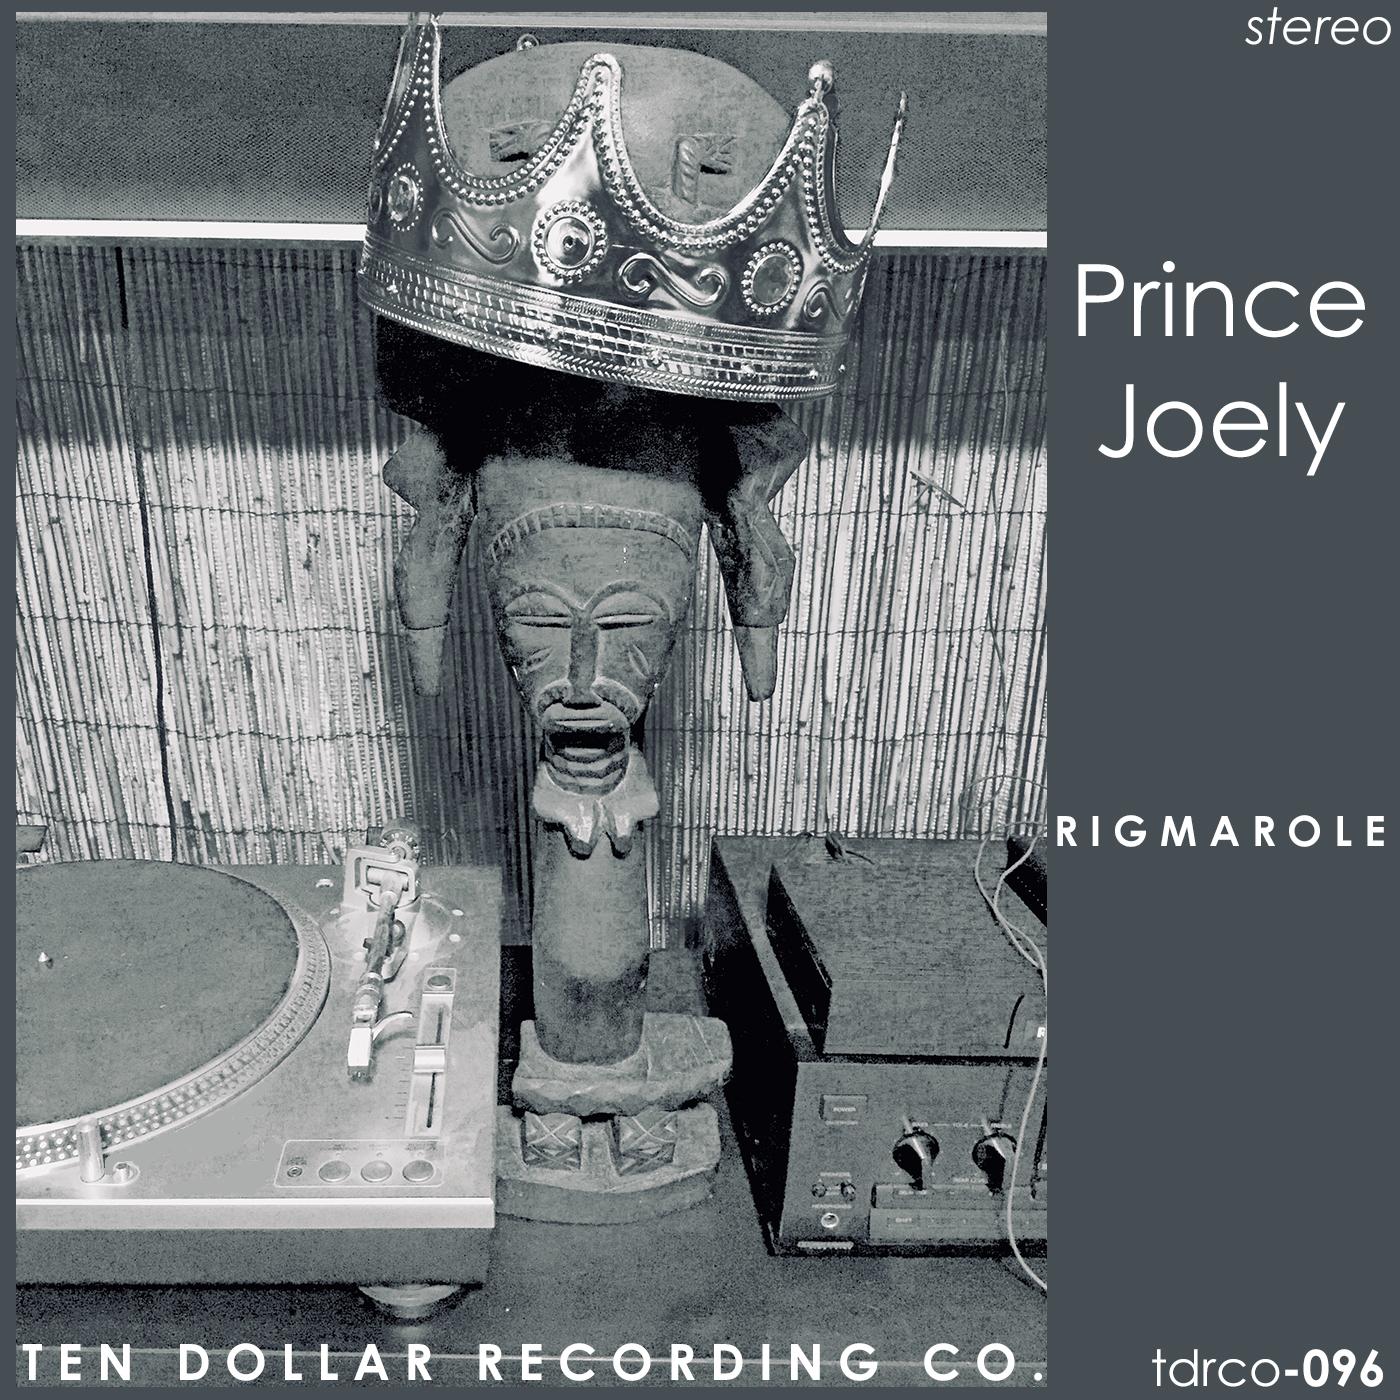 Prince Joely - Rigmarole (Single)